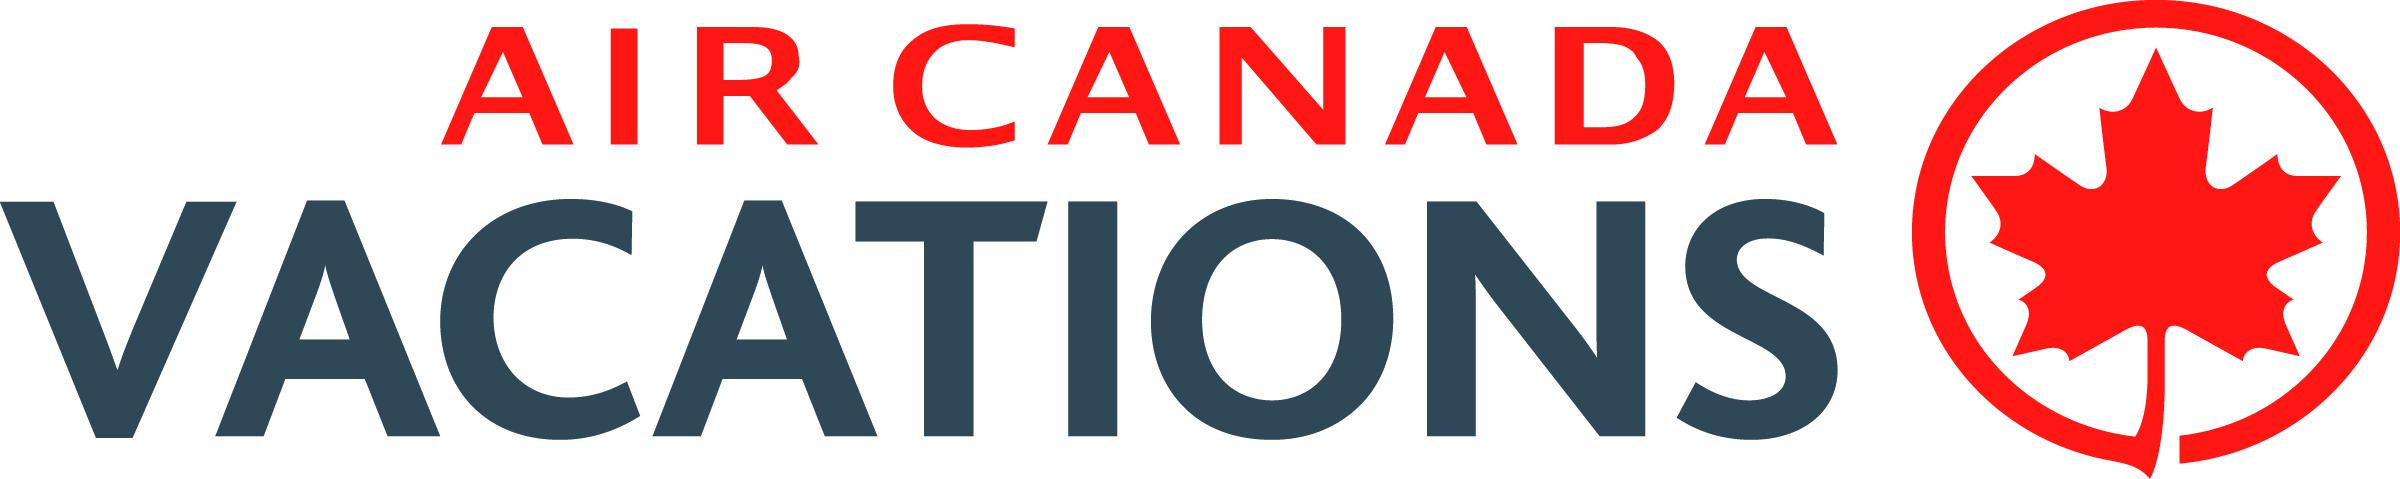 Destination Weddings With Total Advantage Air Canada Vacations - Canada vacations